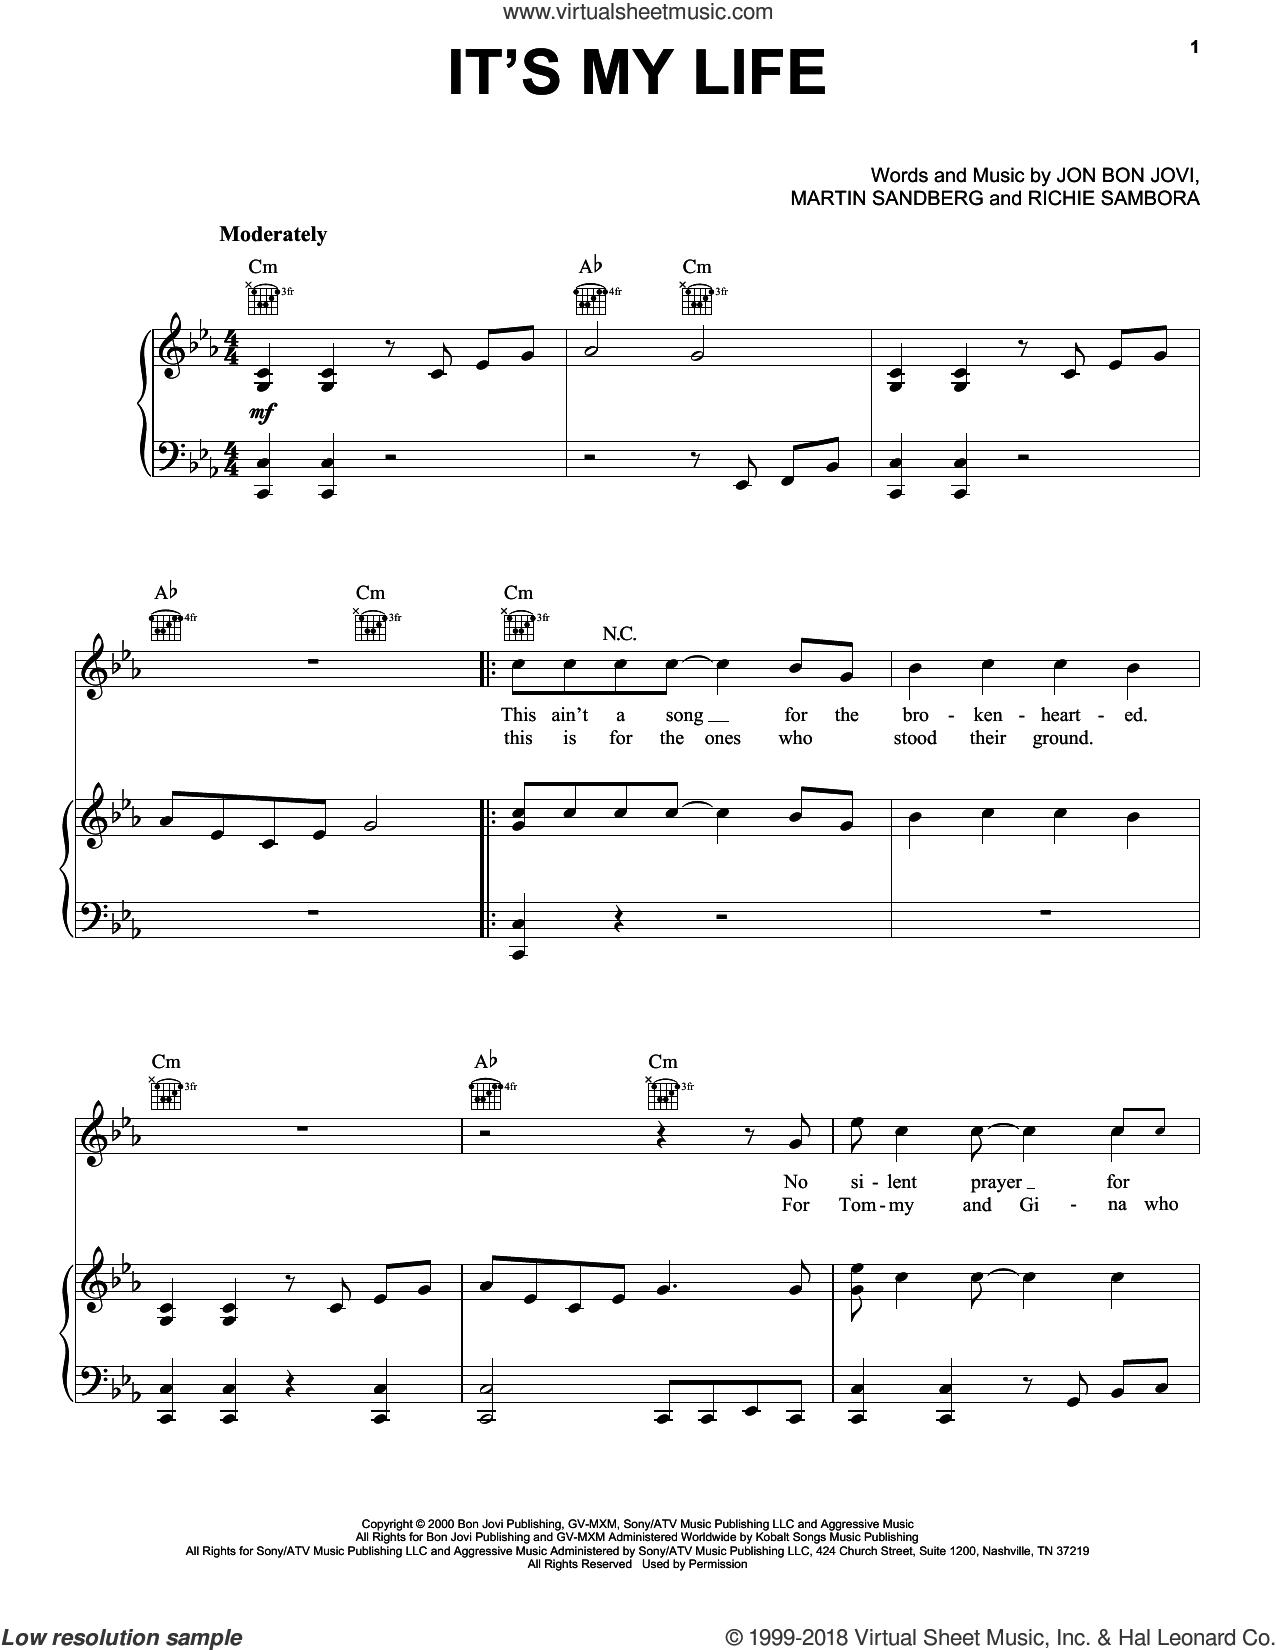 It's My Life sheet music for voice, piano or guitar by Bon Jovi, Miscellaneous, Martin Sandberg and Richie Sambora, intermediate skill level